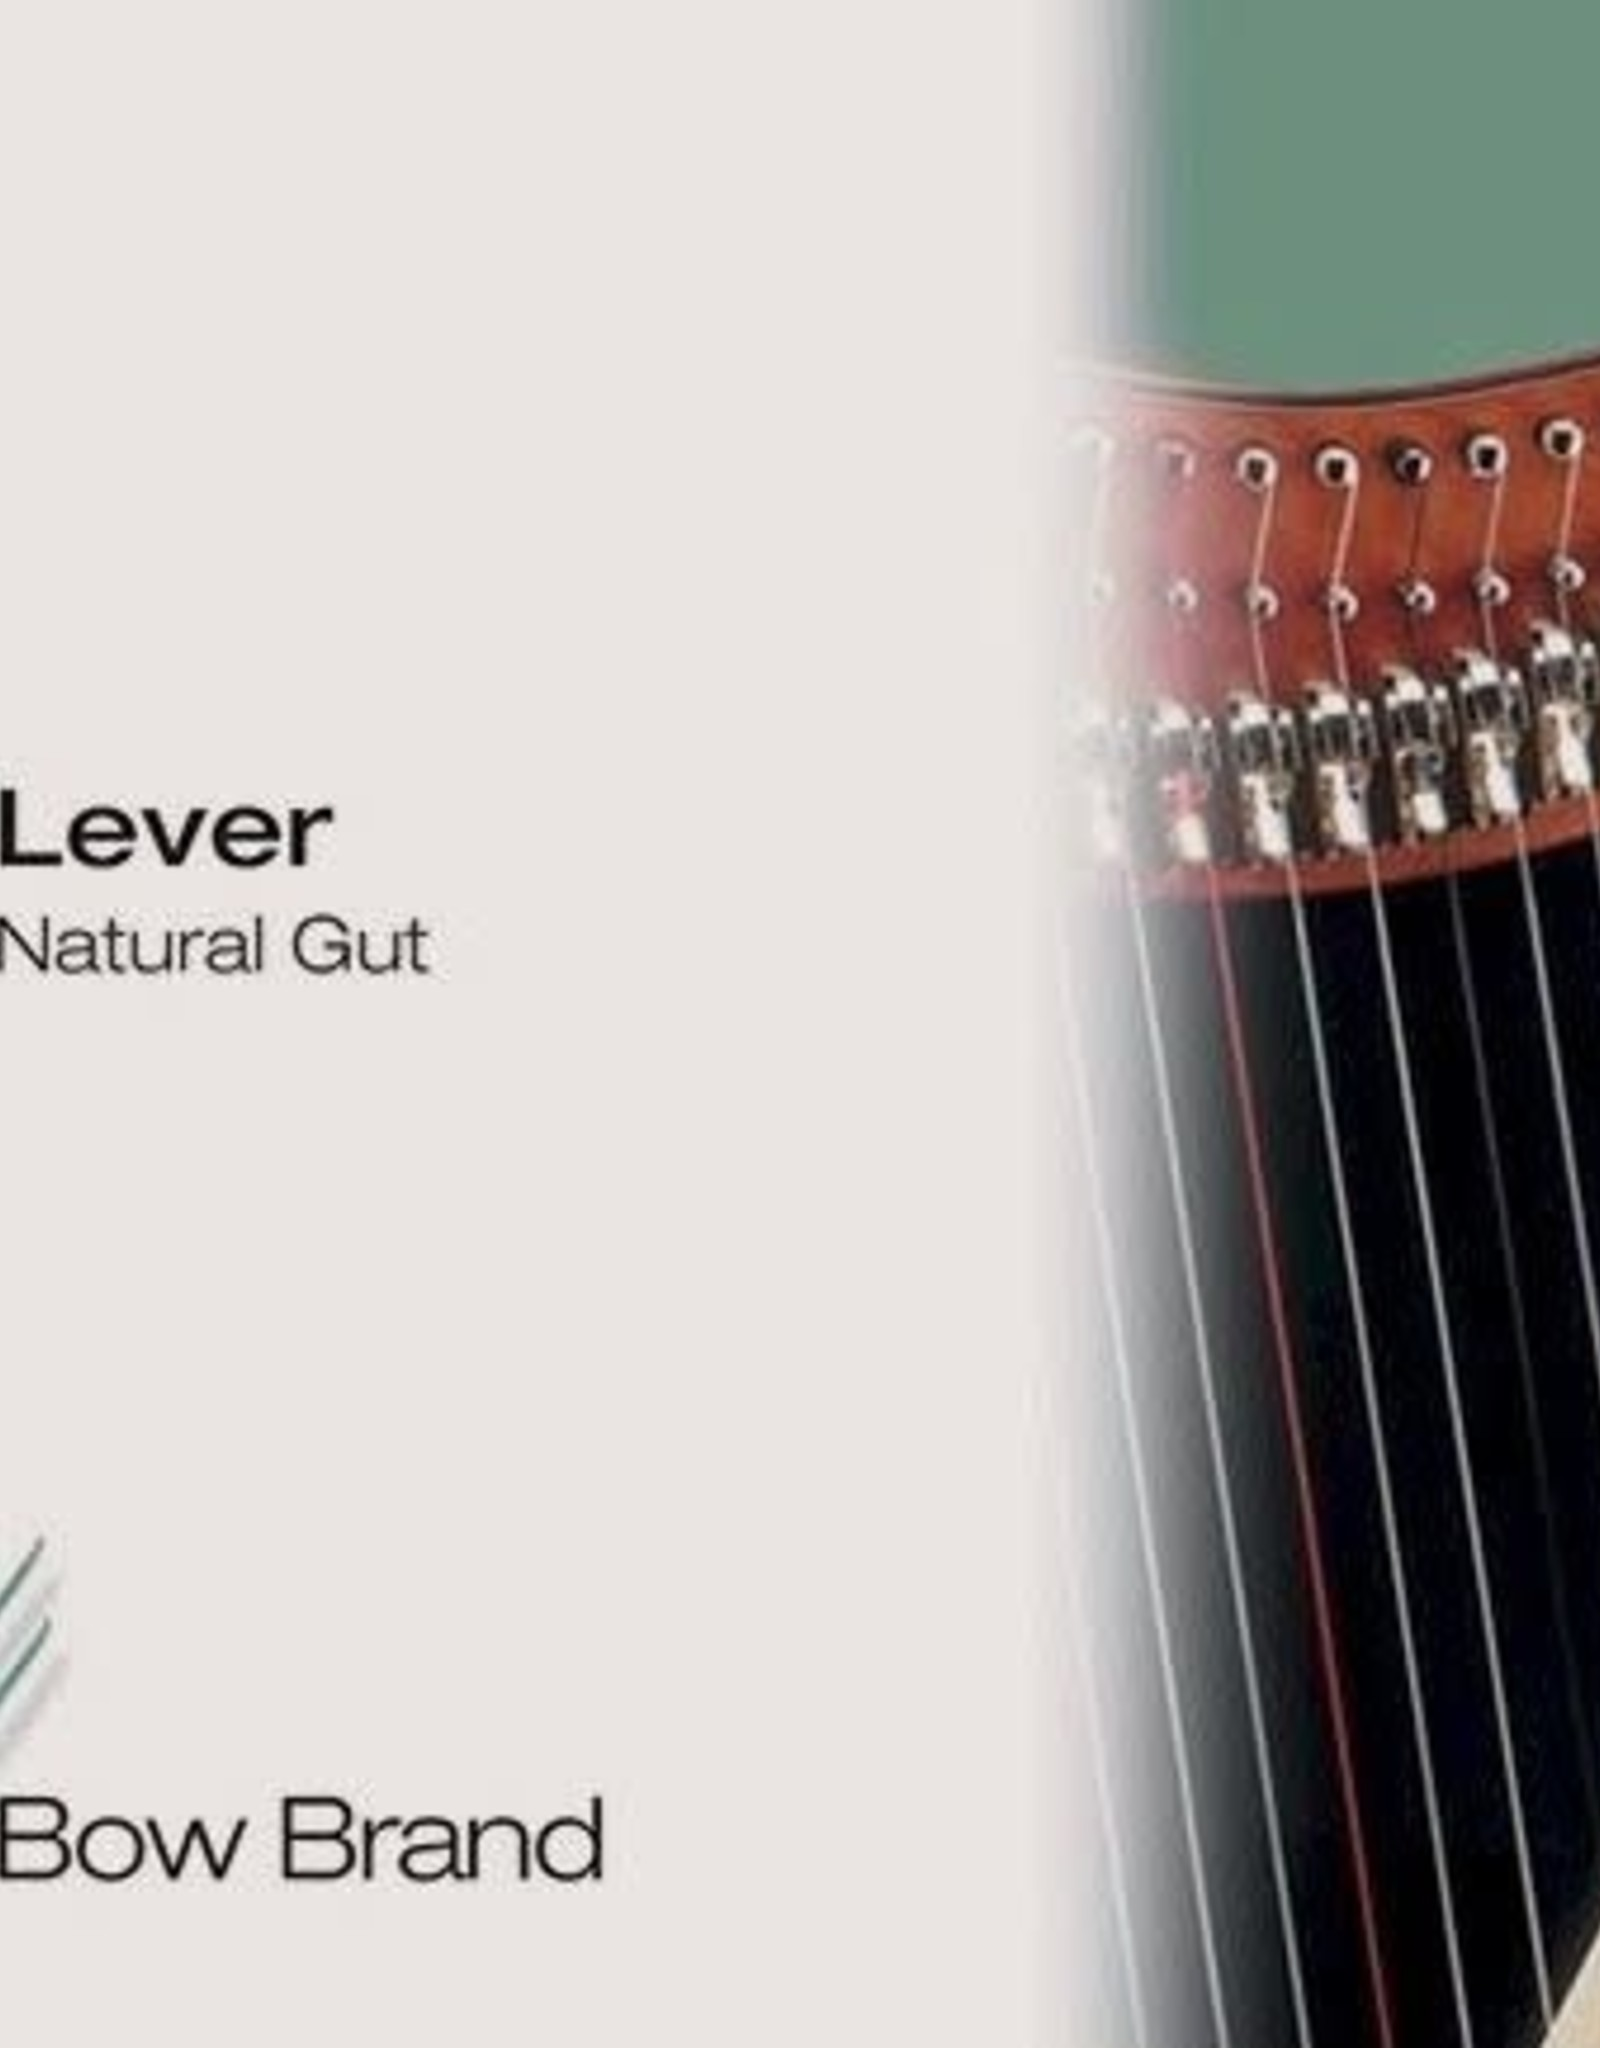 BOW BRAND  klep darm - lever GUT 3/1 do